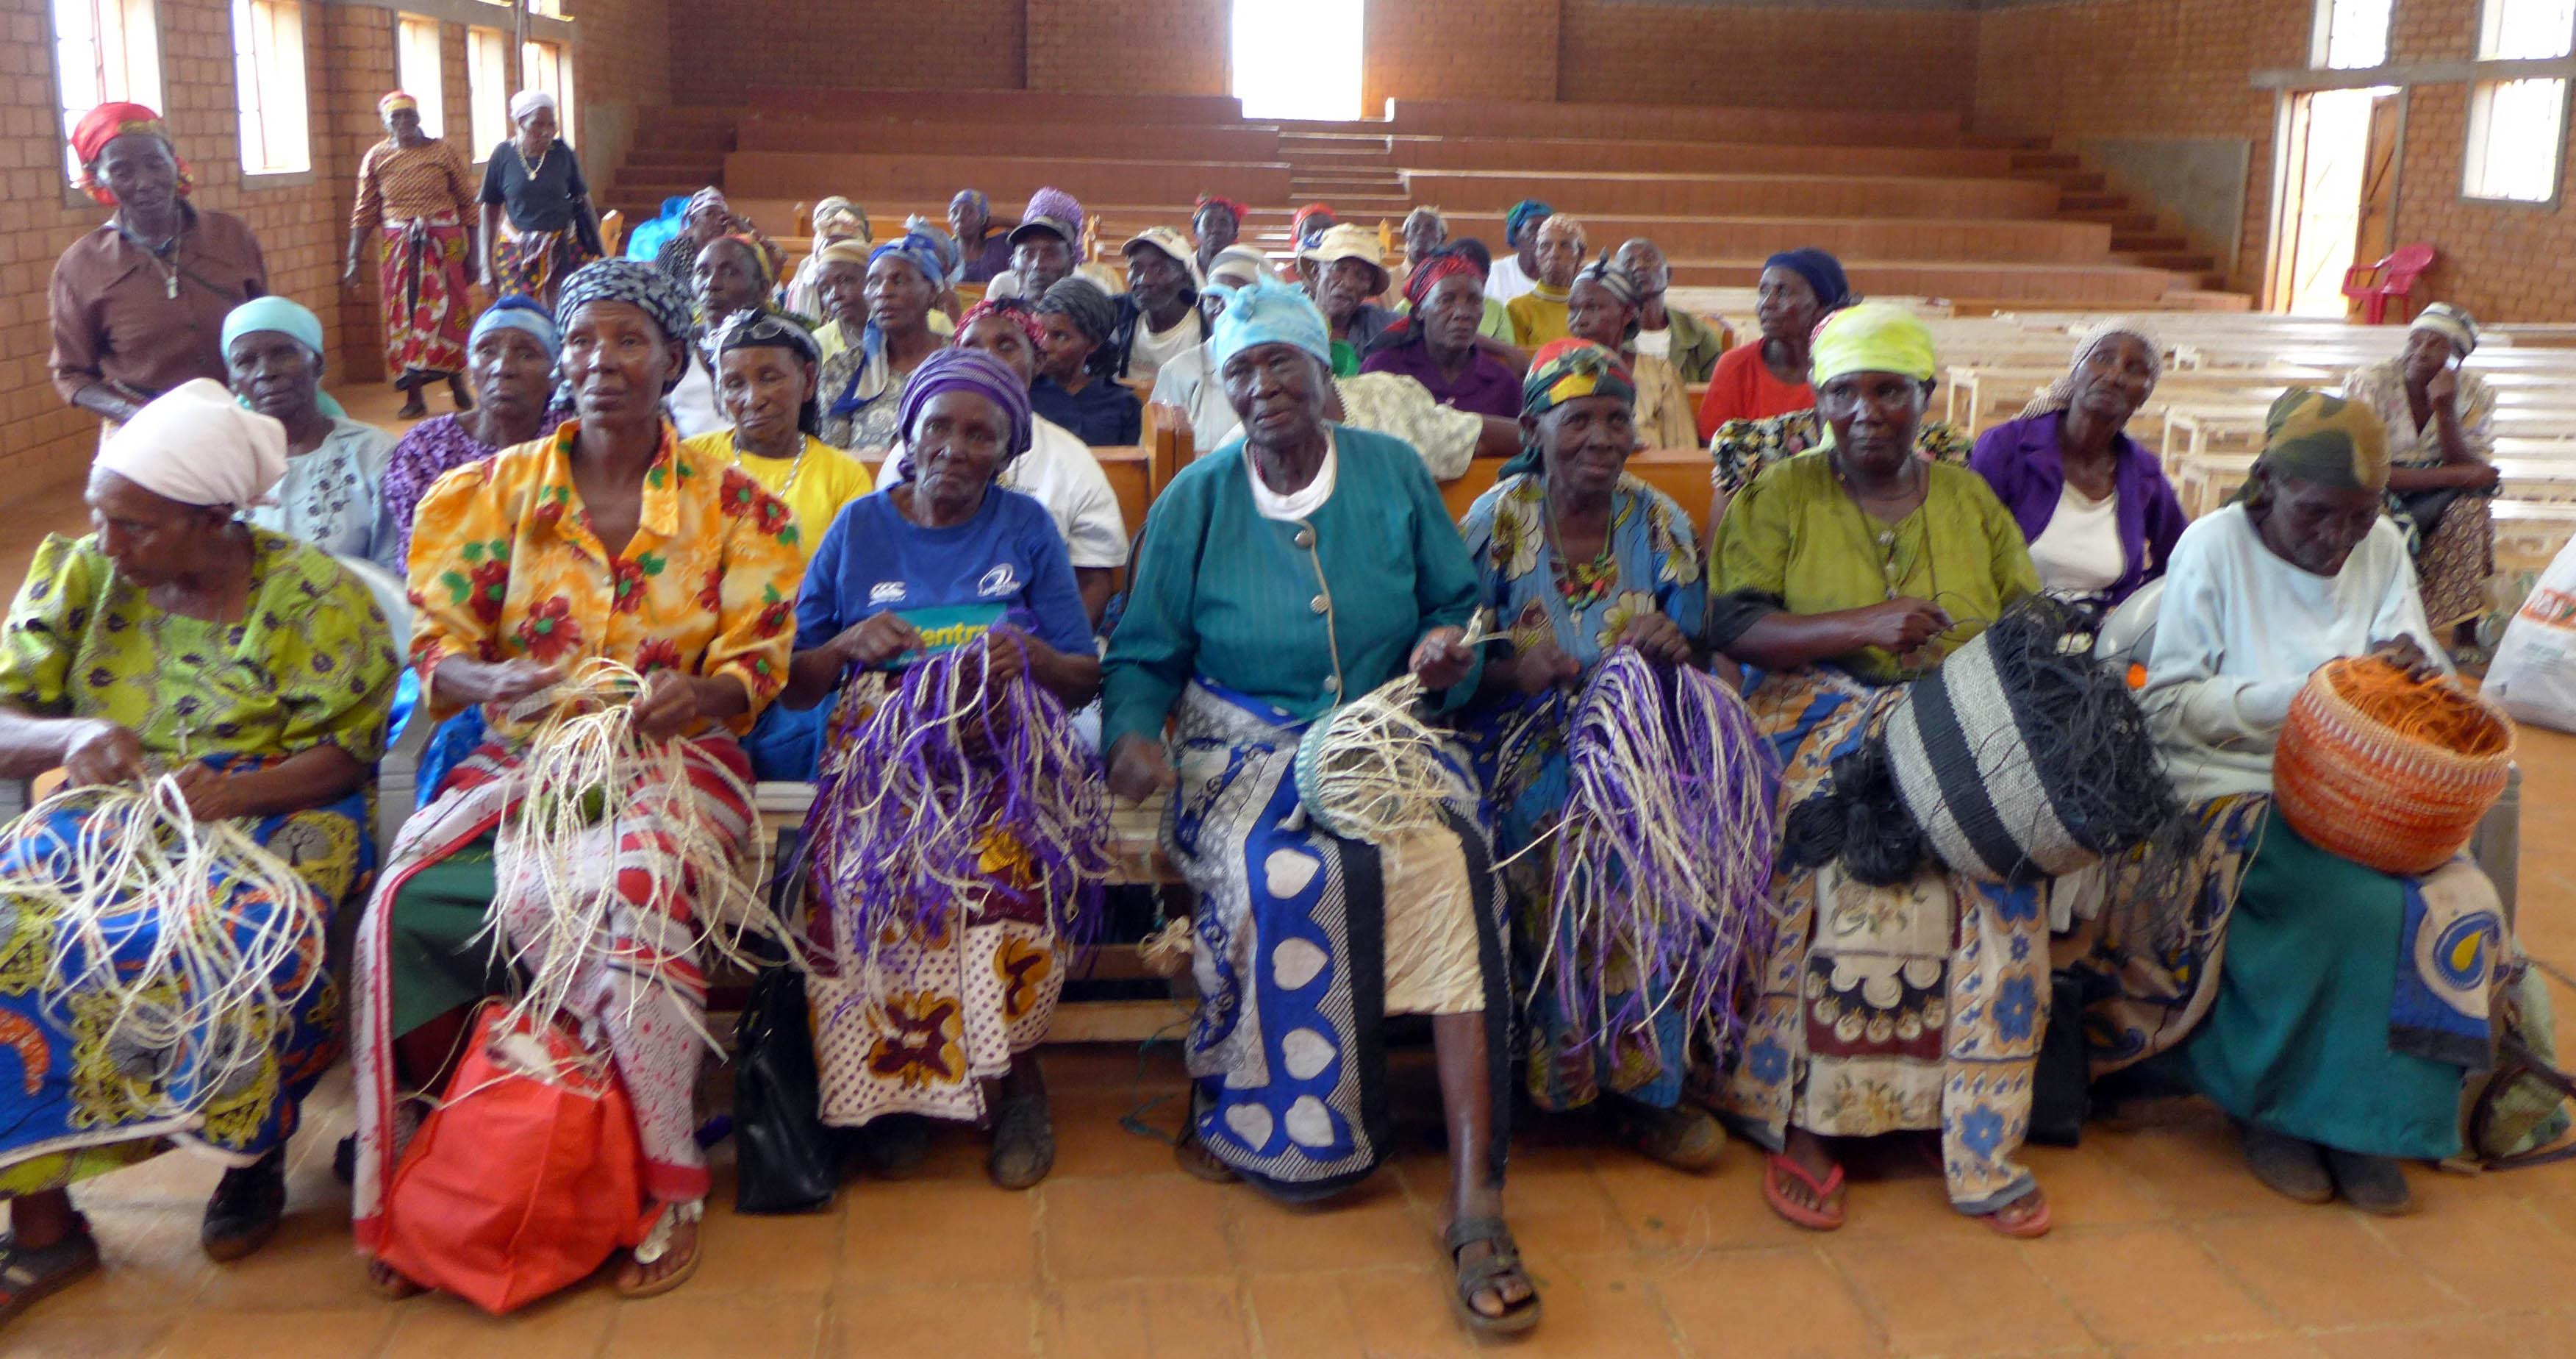 A row of basket weavers